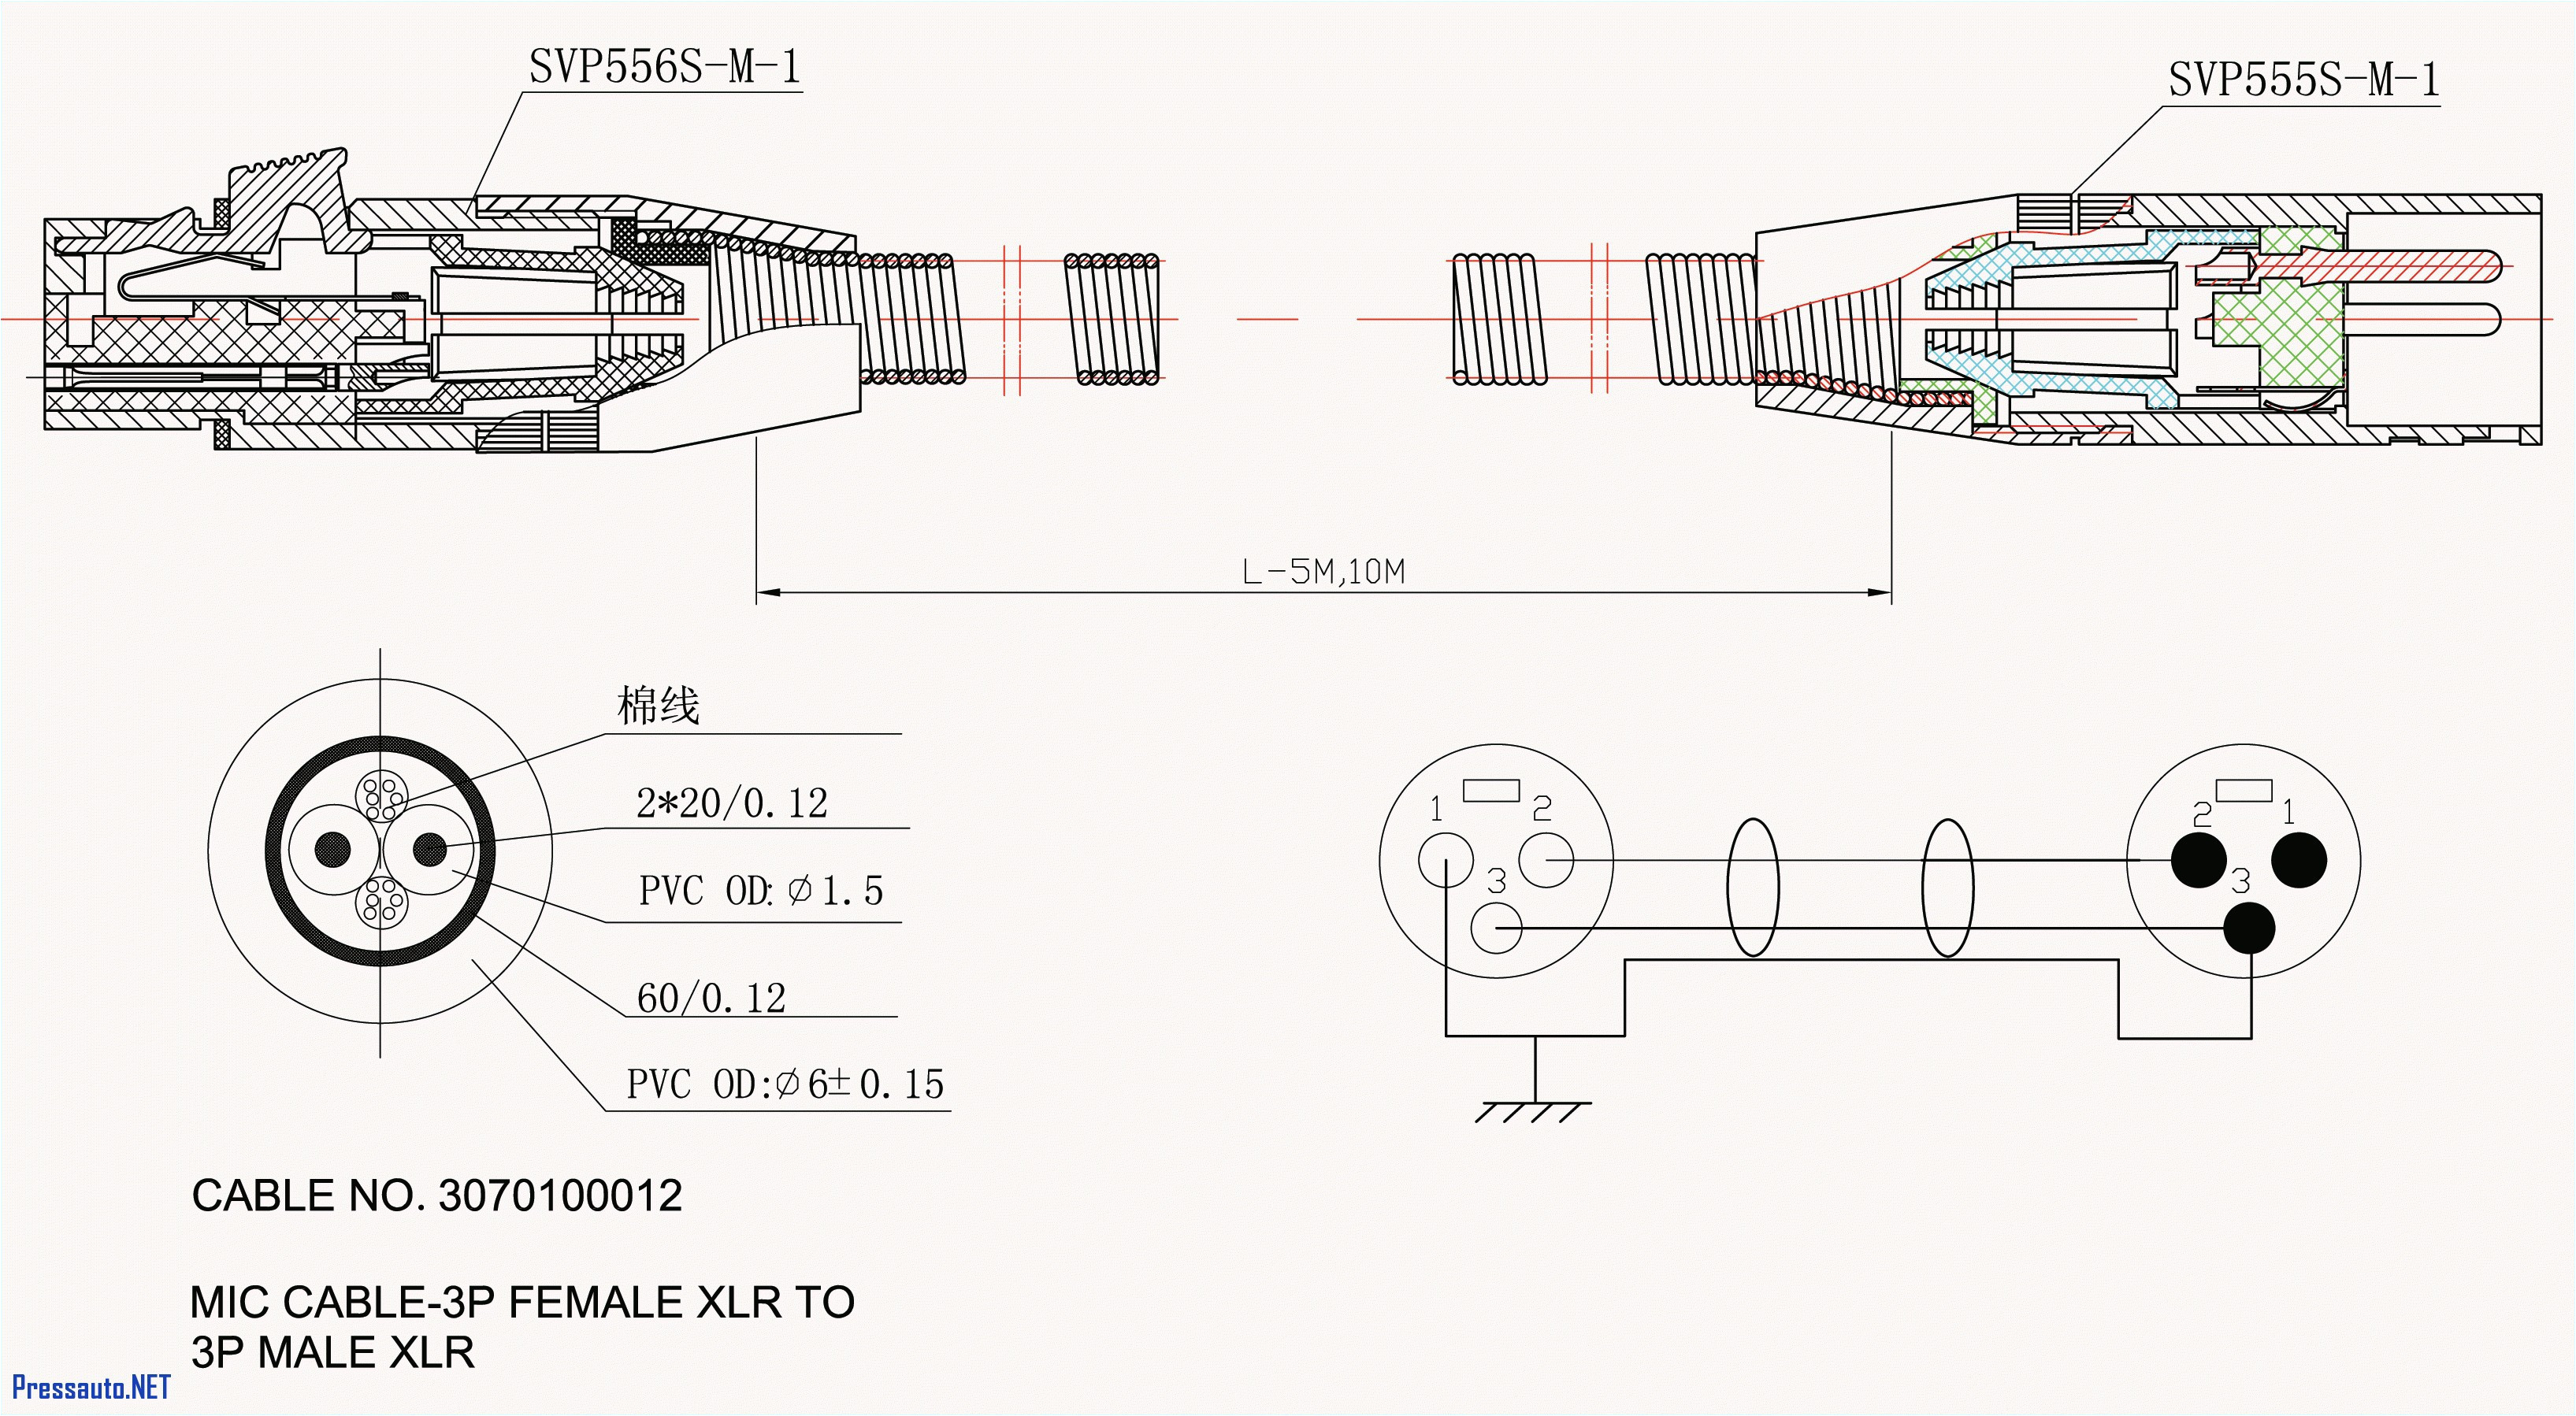 chevy 6 0 wiring diagram wiring diagram name chevy 6 0 wiring diagram